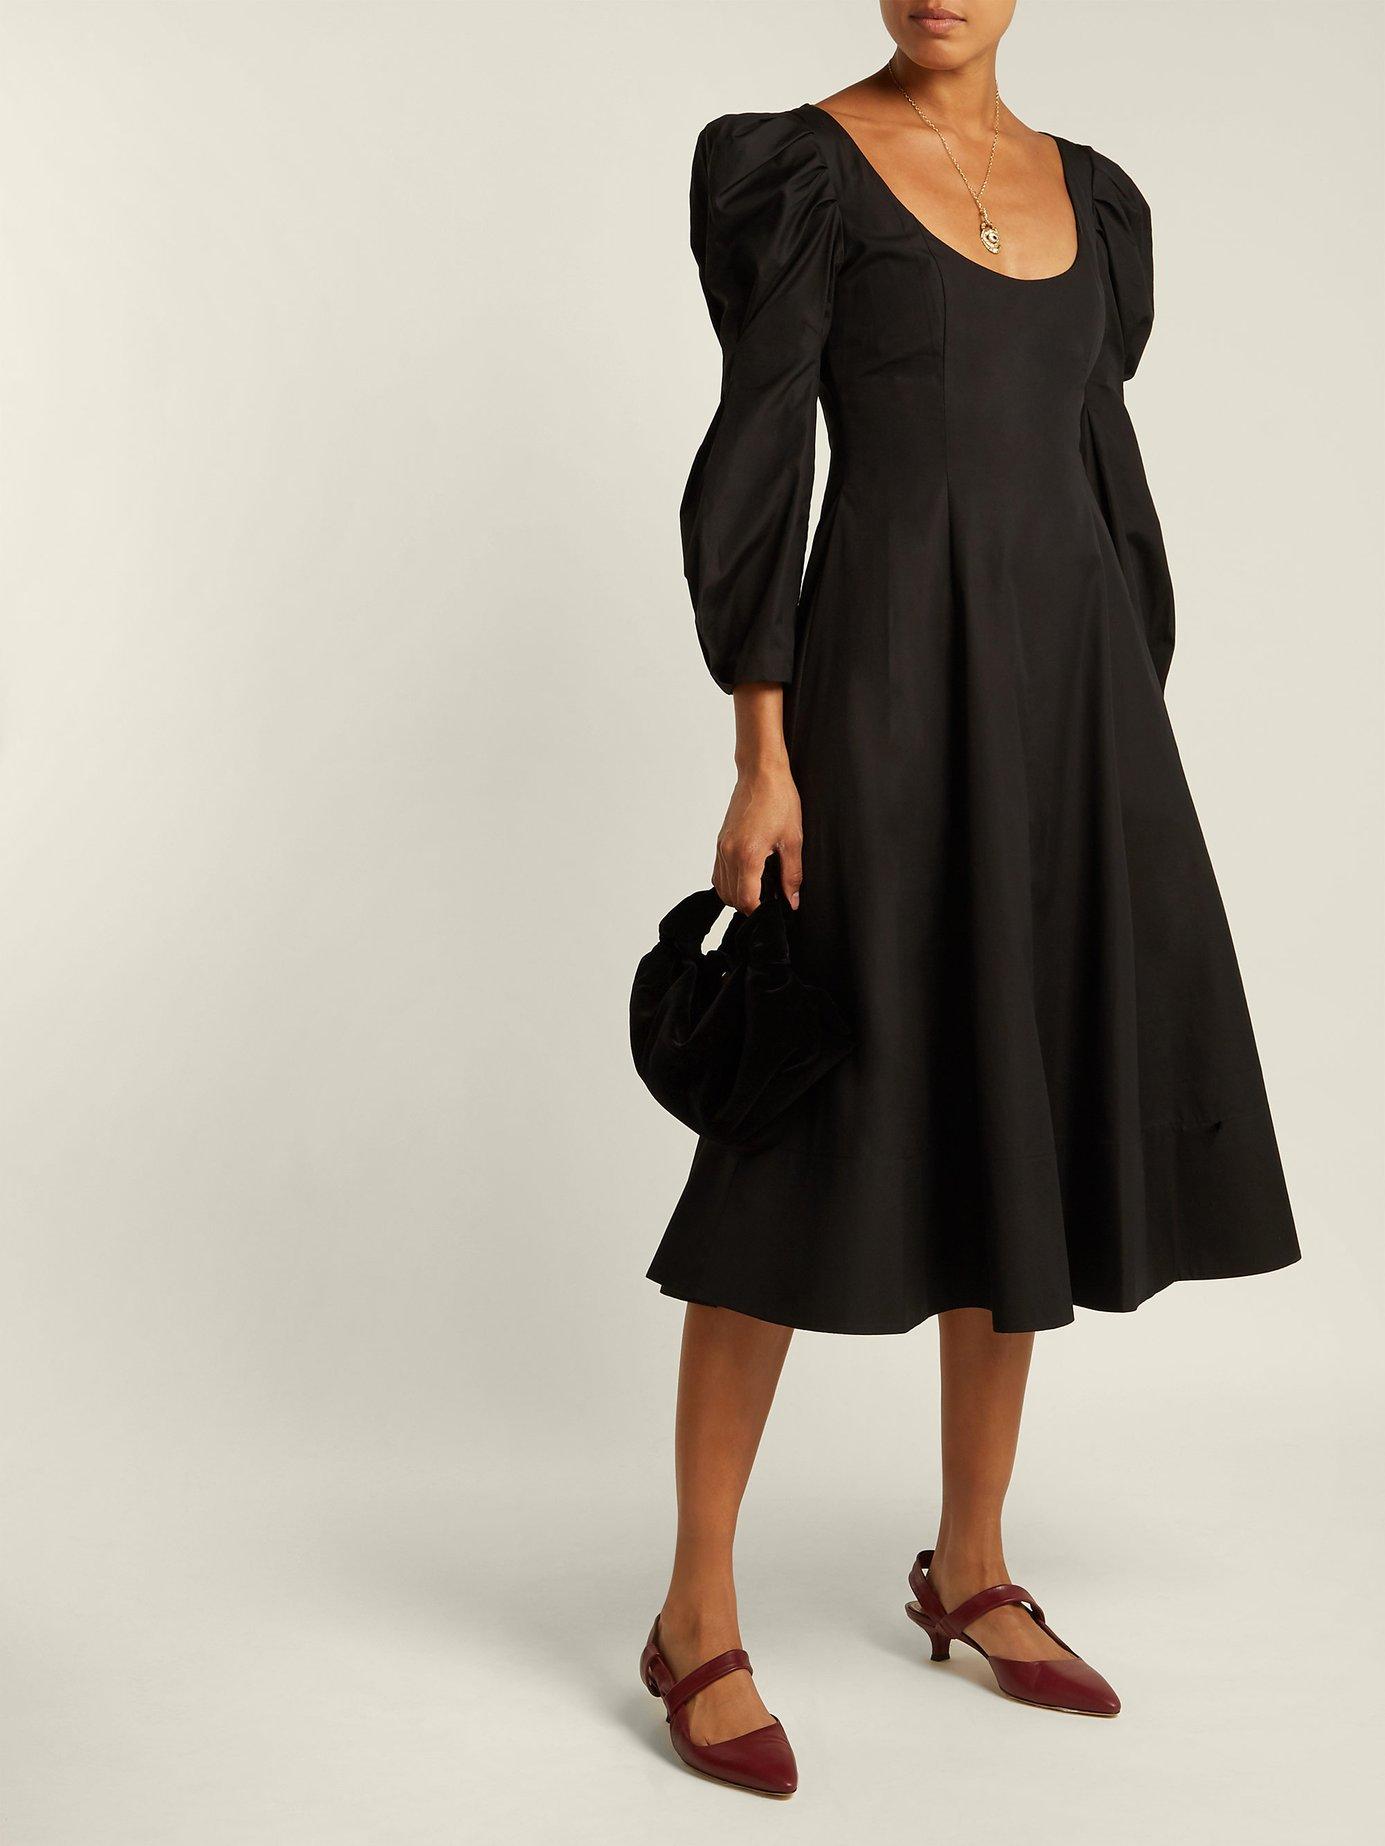 Edwina bodice cotton dress by Khaite